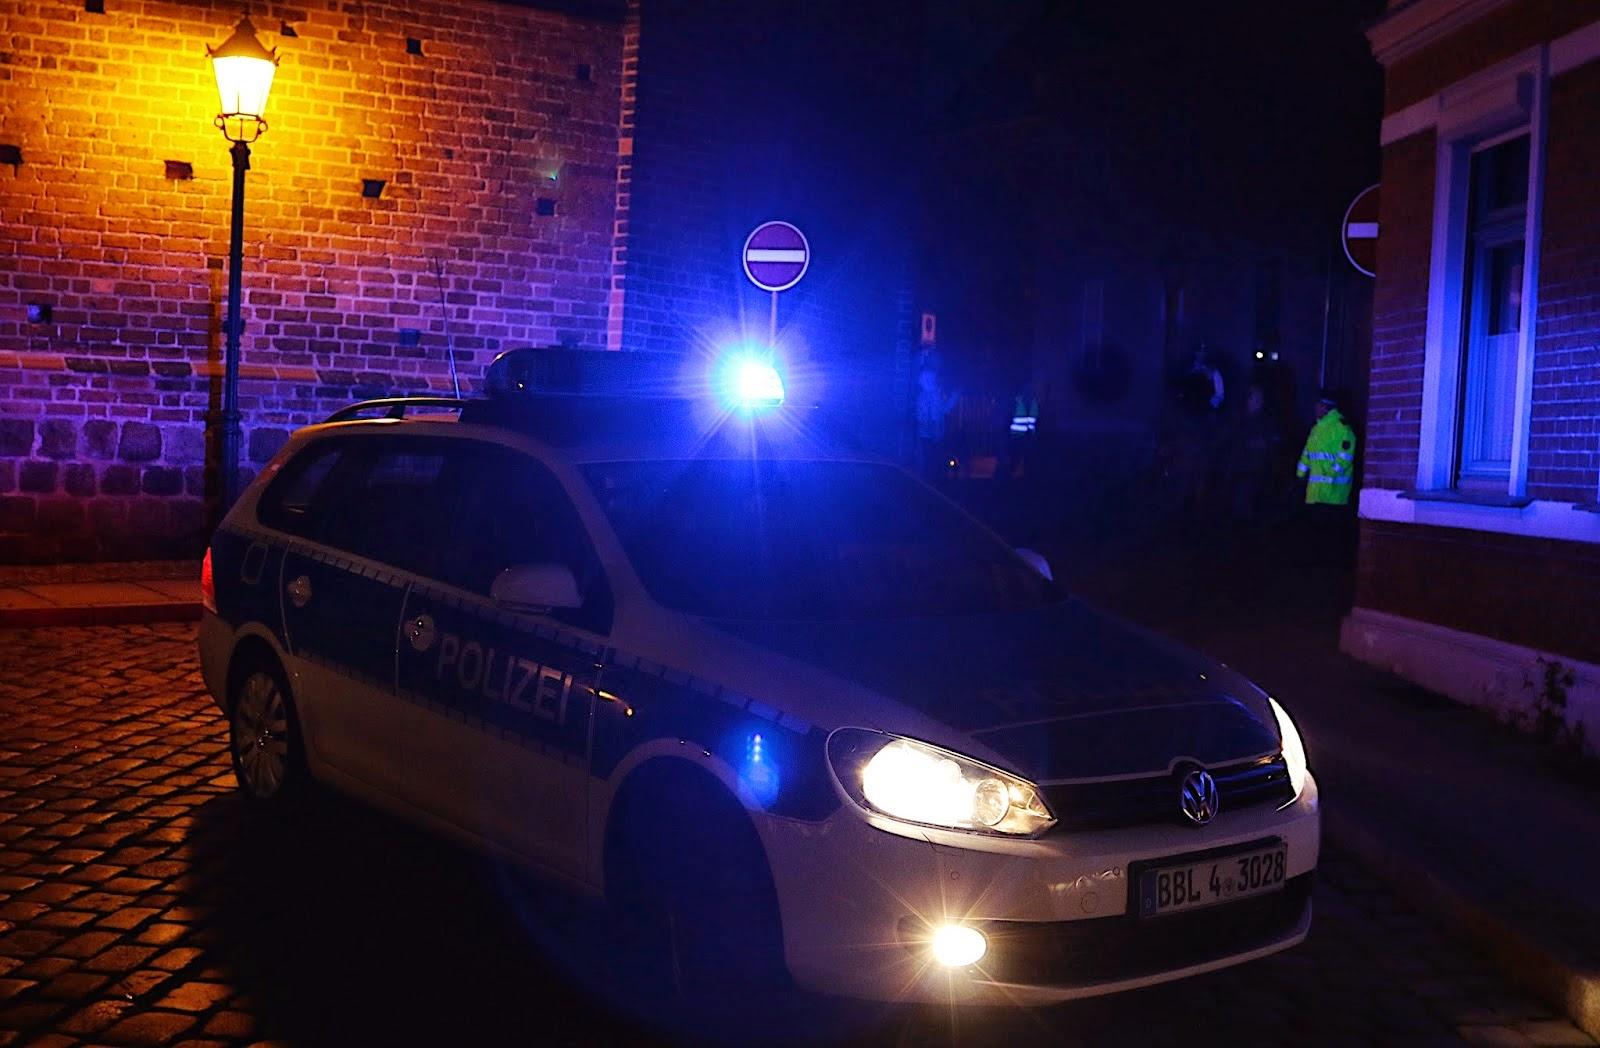 Polizei%2BIMG 2305%2B(1)